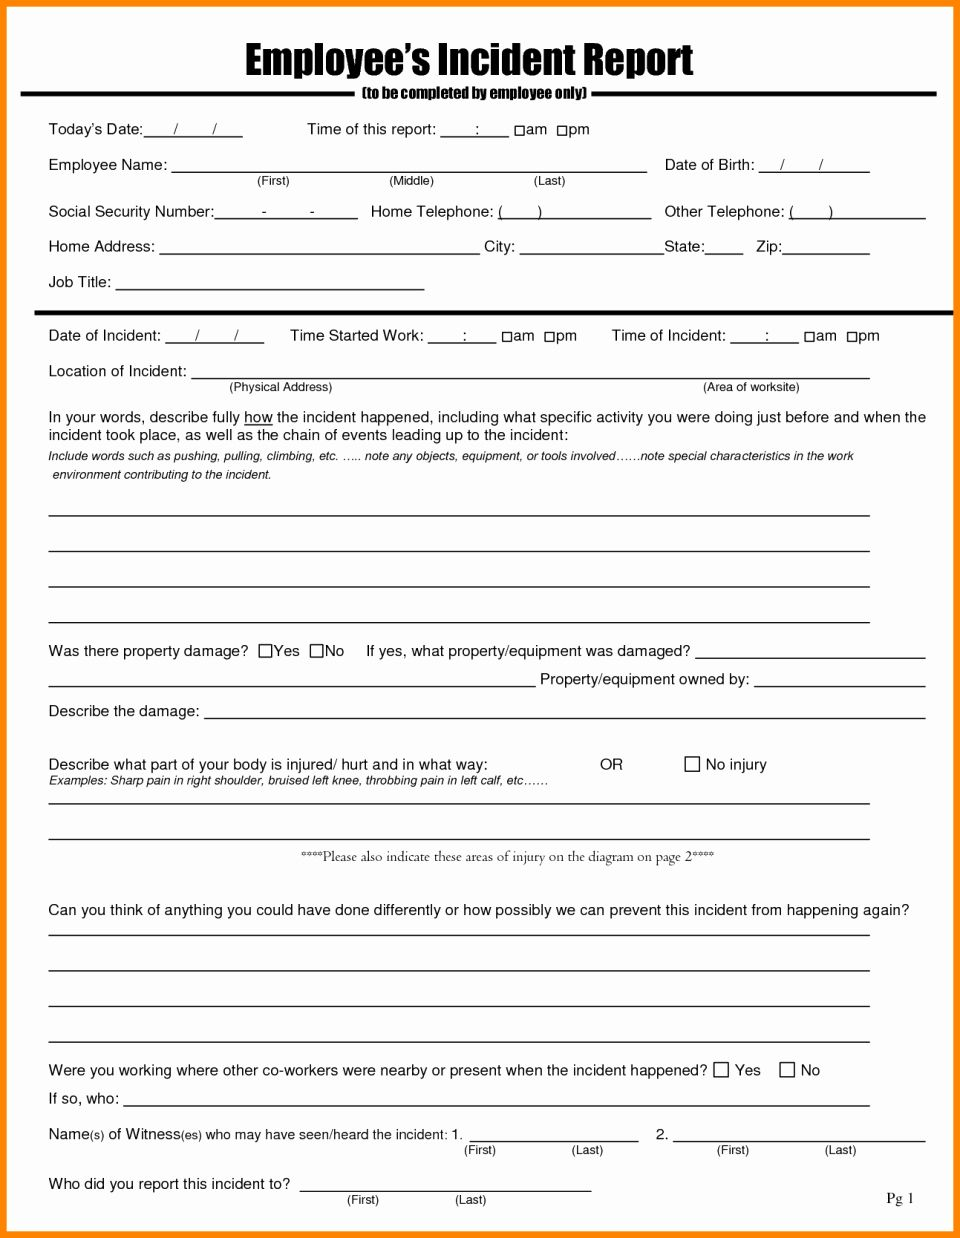 Nursing Incident Report Sample Inspirational Accident Report Sample Format Car Incident Investigation Report Card Template Incident Report Form Report Template